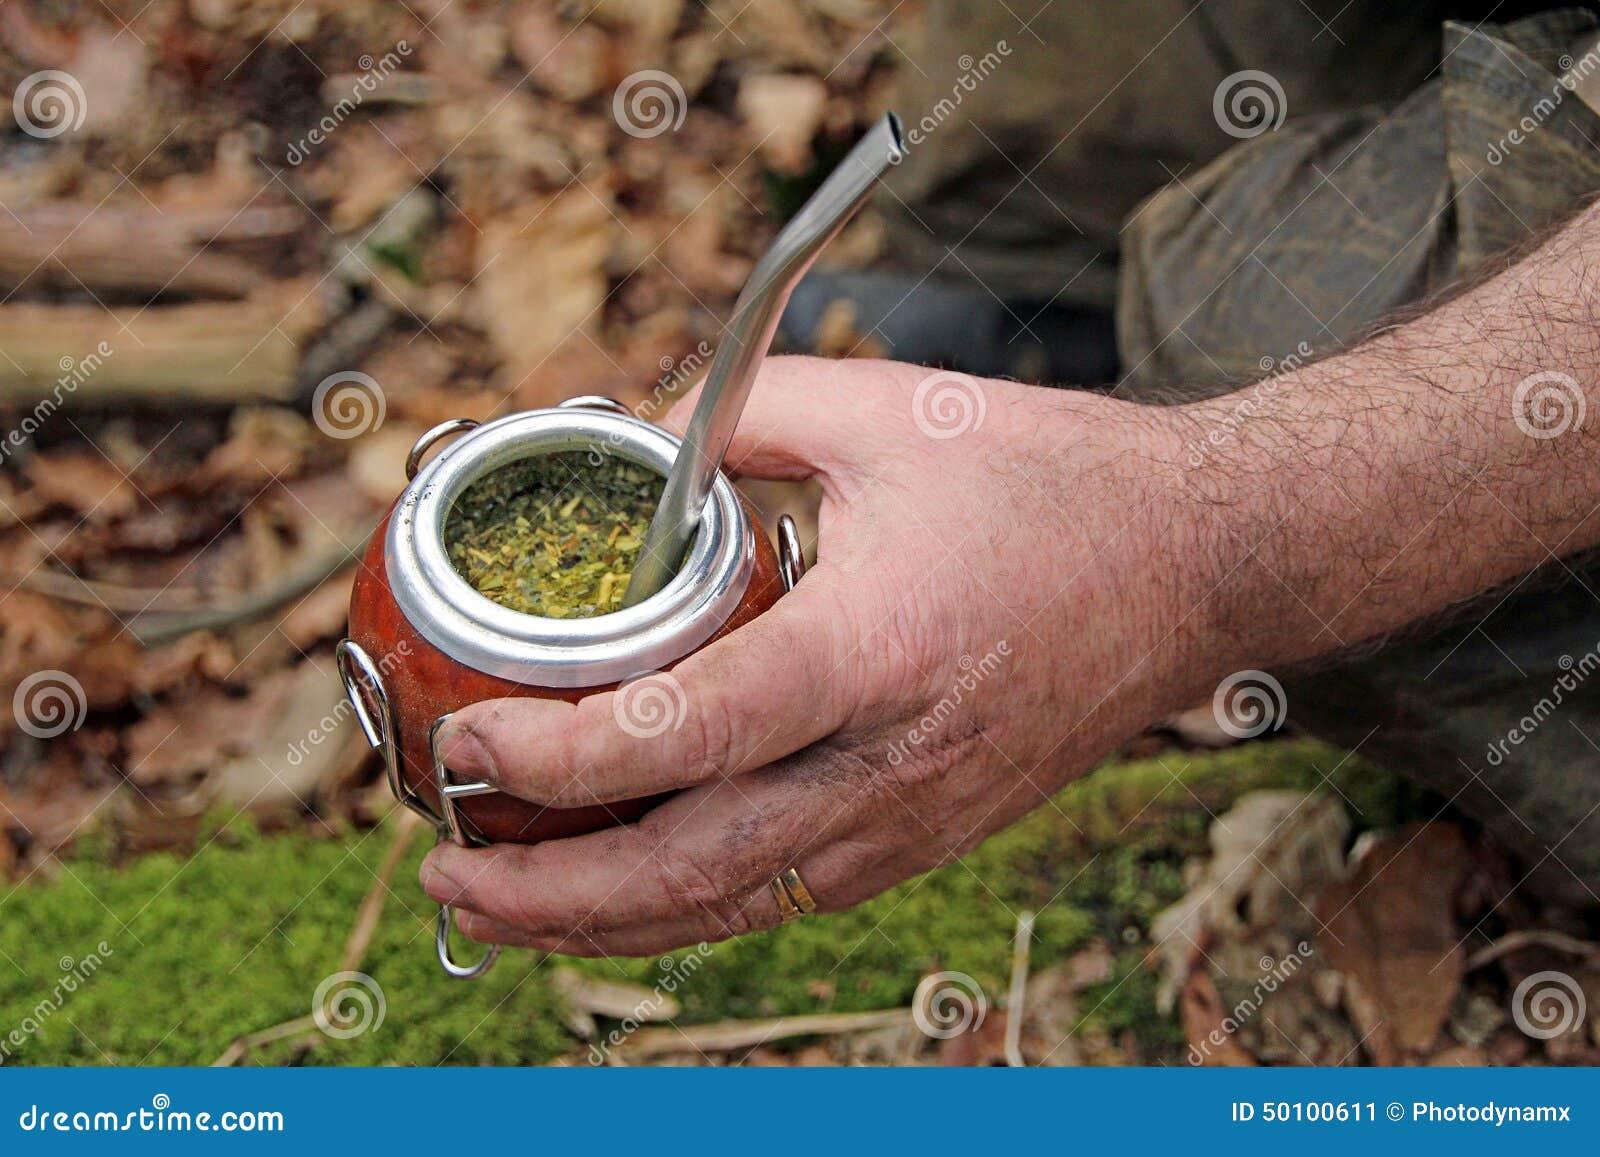 Yerba Mate Gourd And Bombilla Straw Stock Image - Image ...  Yerba Mate Gour...